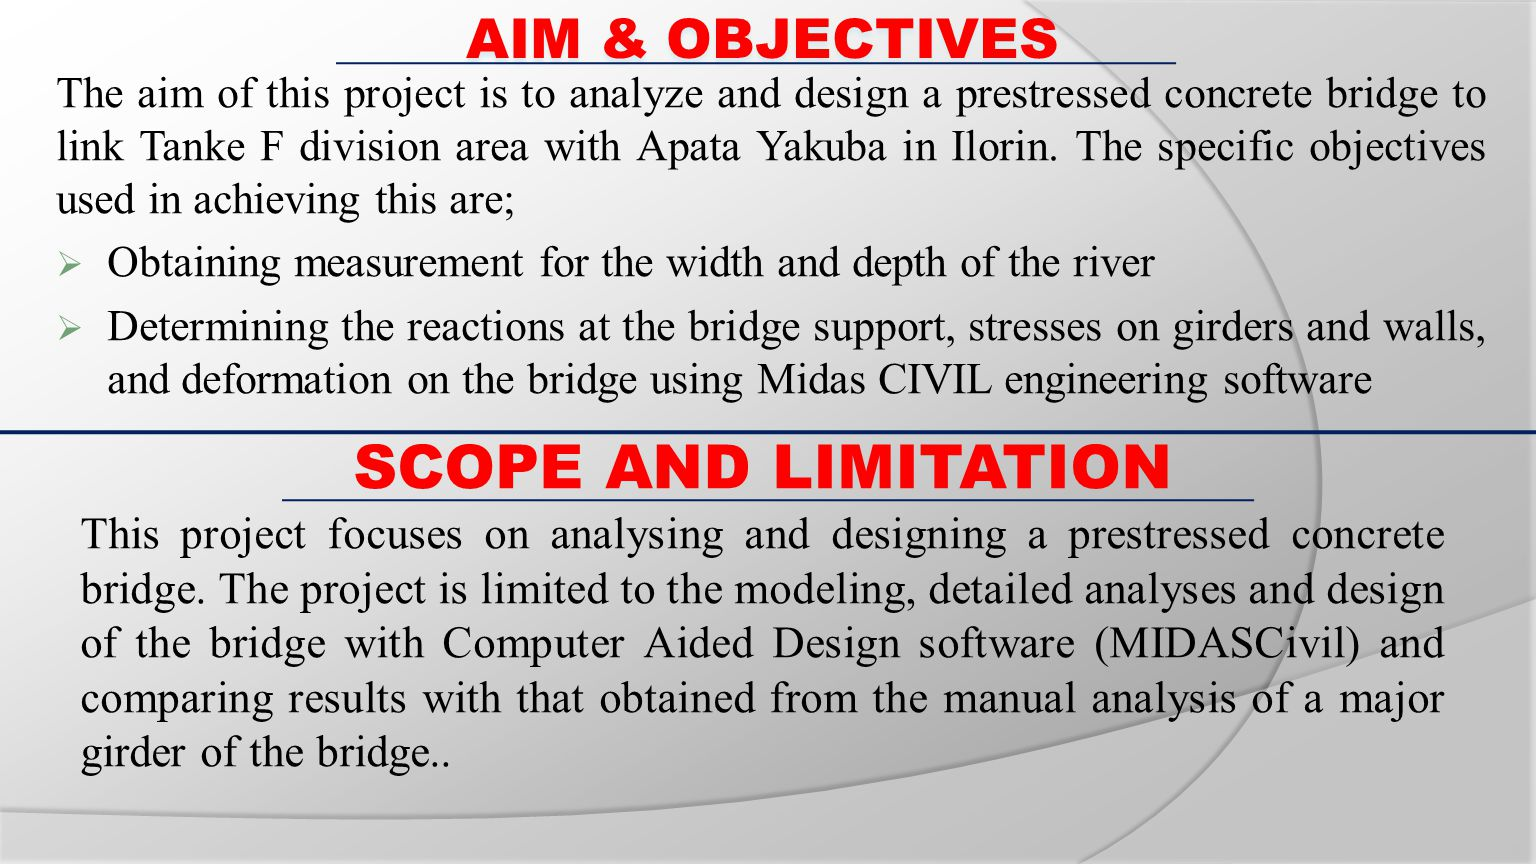 ANALYSIS AND DESIGN OF PRESTRESSED CONCRETE BRIDGE - ppt video